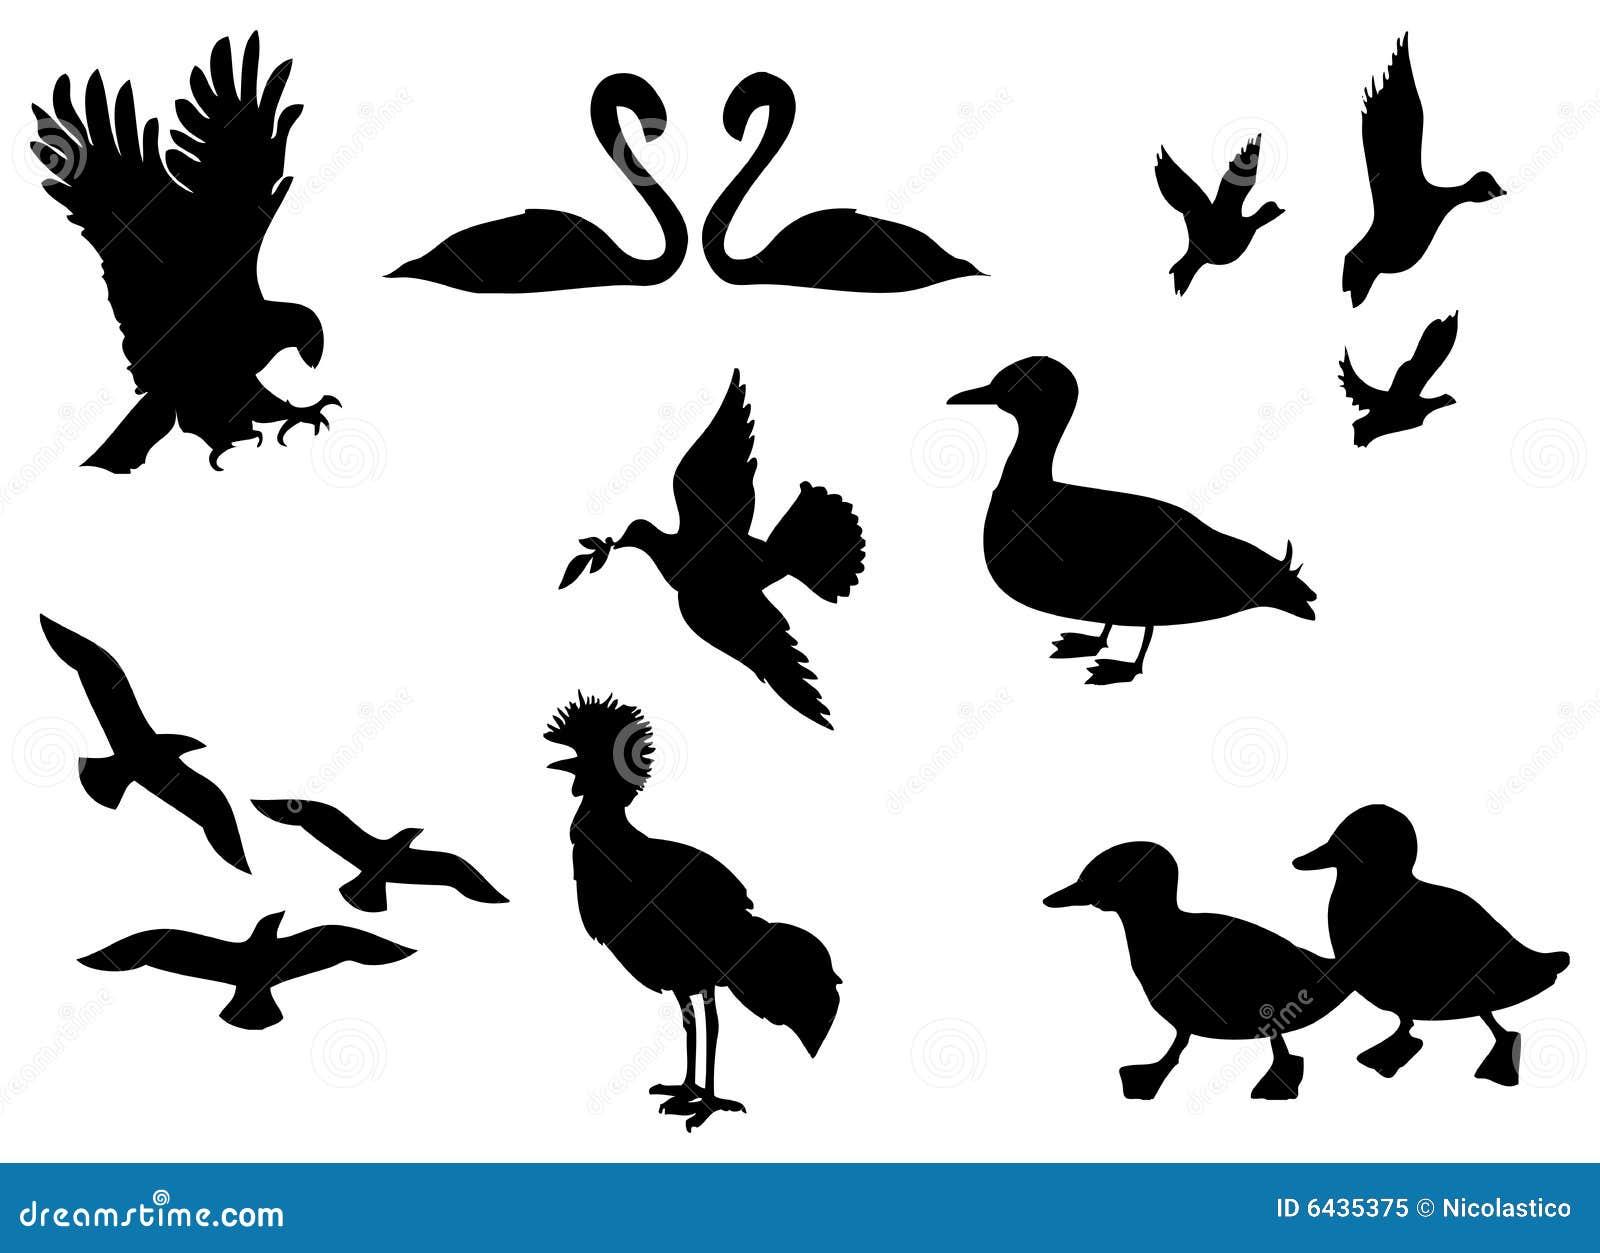 Fågelsilhouette